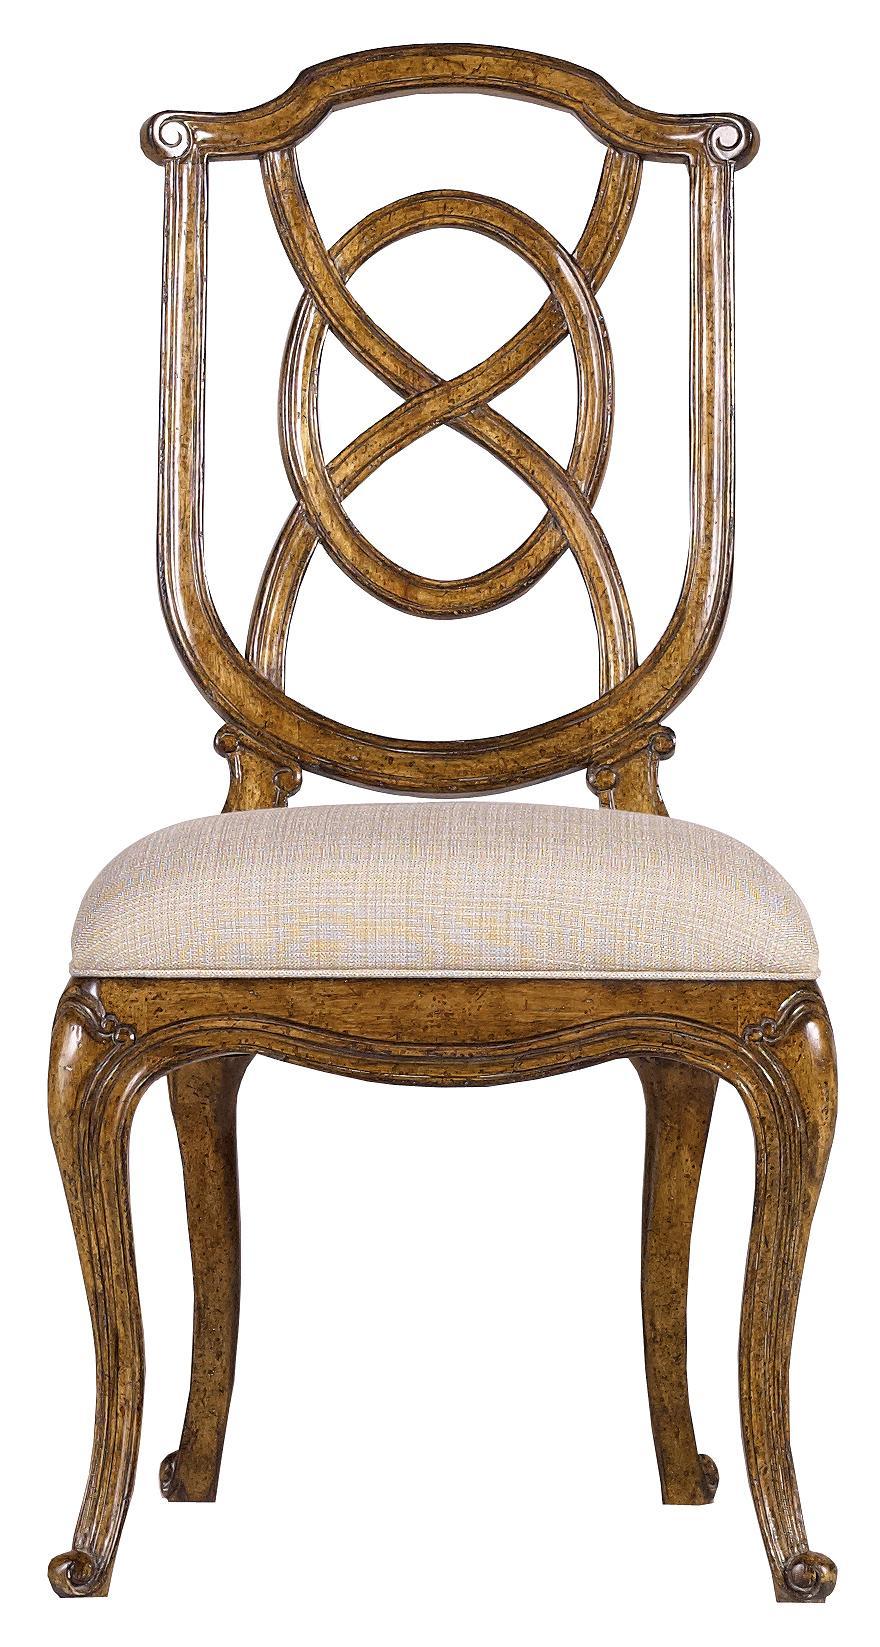 Stanley Furniture Arrondissement Tuileries Side Chair - Item Number: 222-61-60